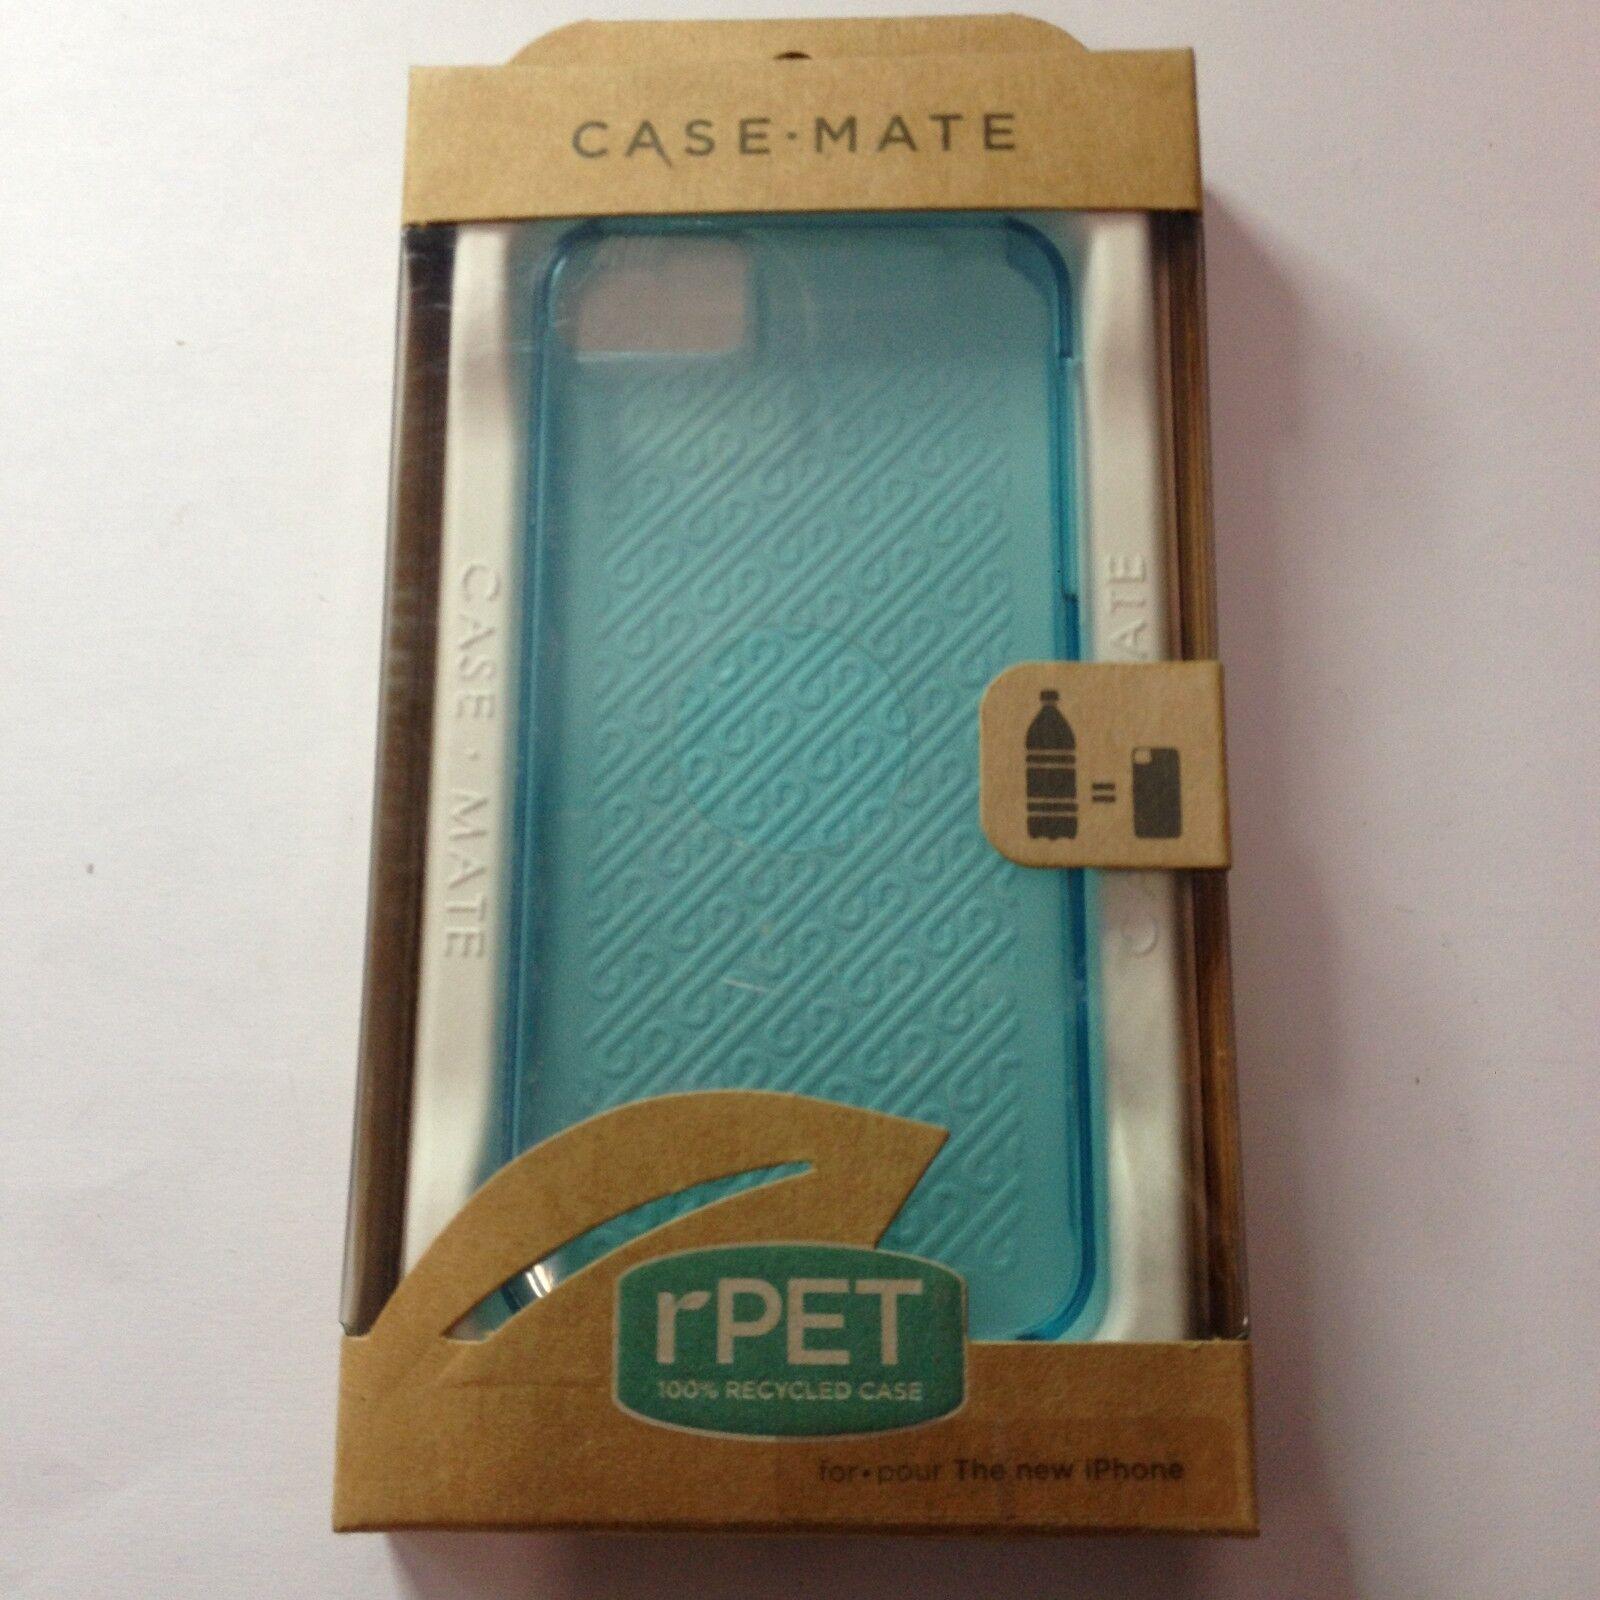 CASE-MATE RPET CASE APPLE IPHONE 5/5S BLUE -CM022580-